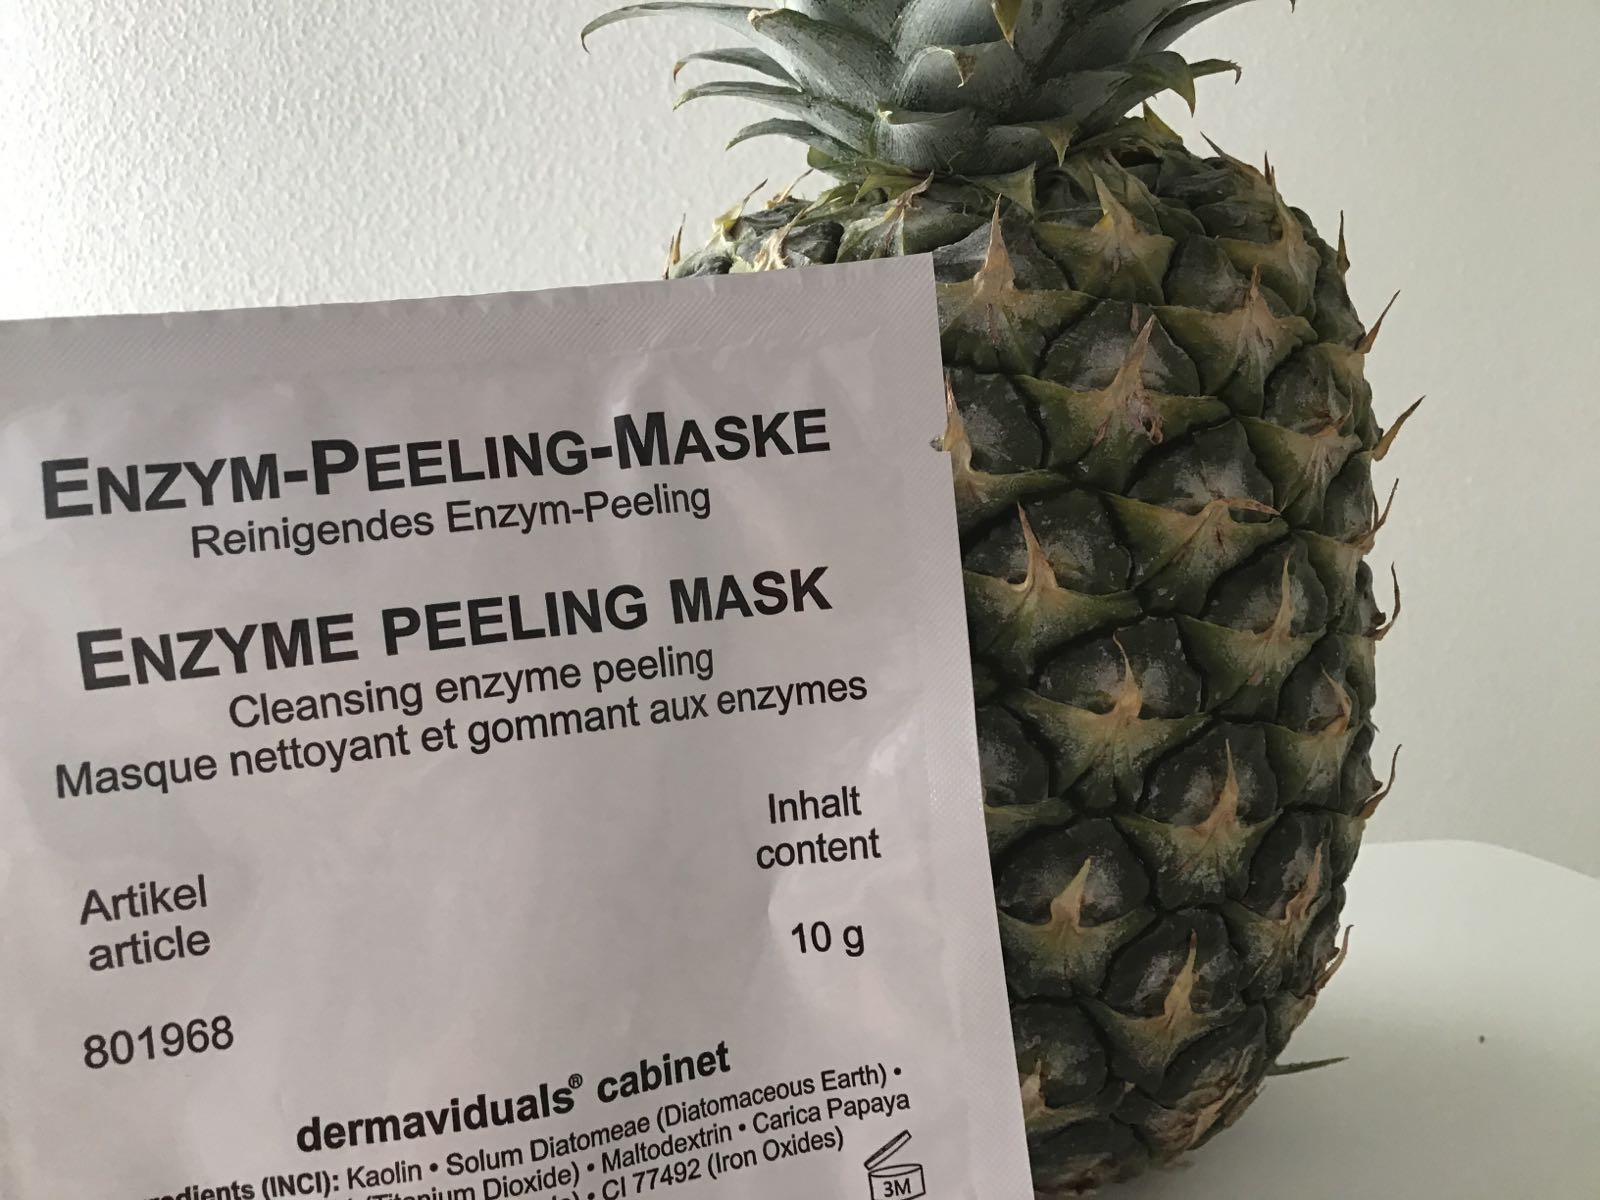 Enzym-Peeling-Maske